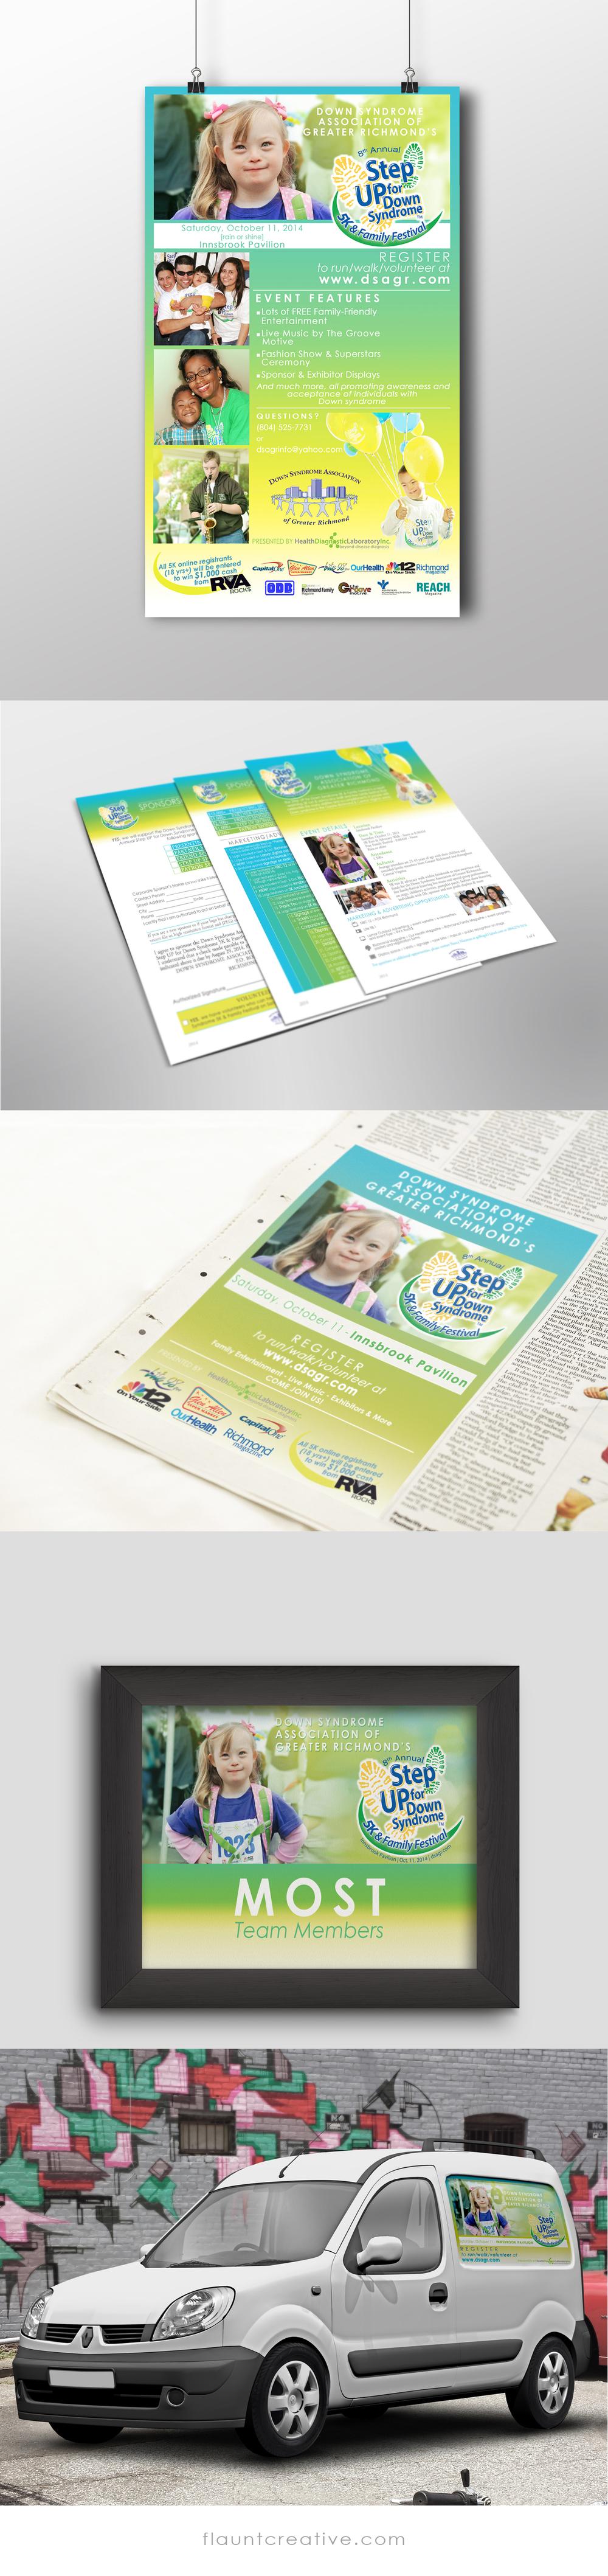 Print + Web AdvertisingMore at www.flauntcreative.com